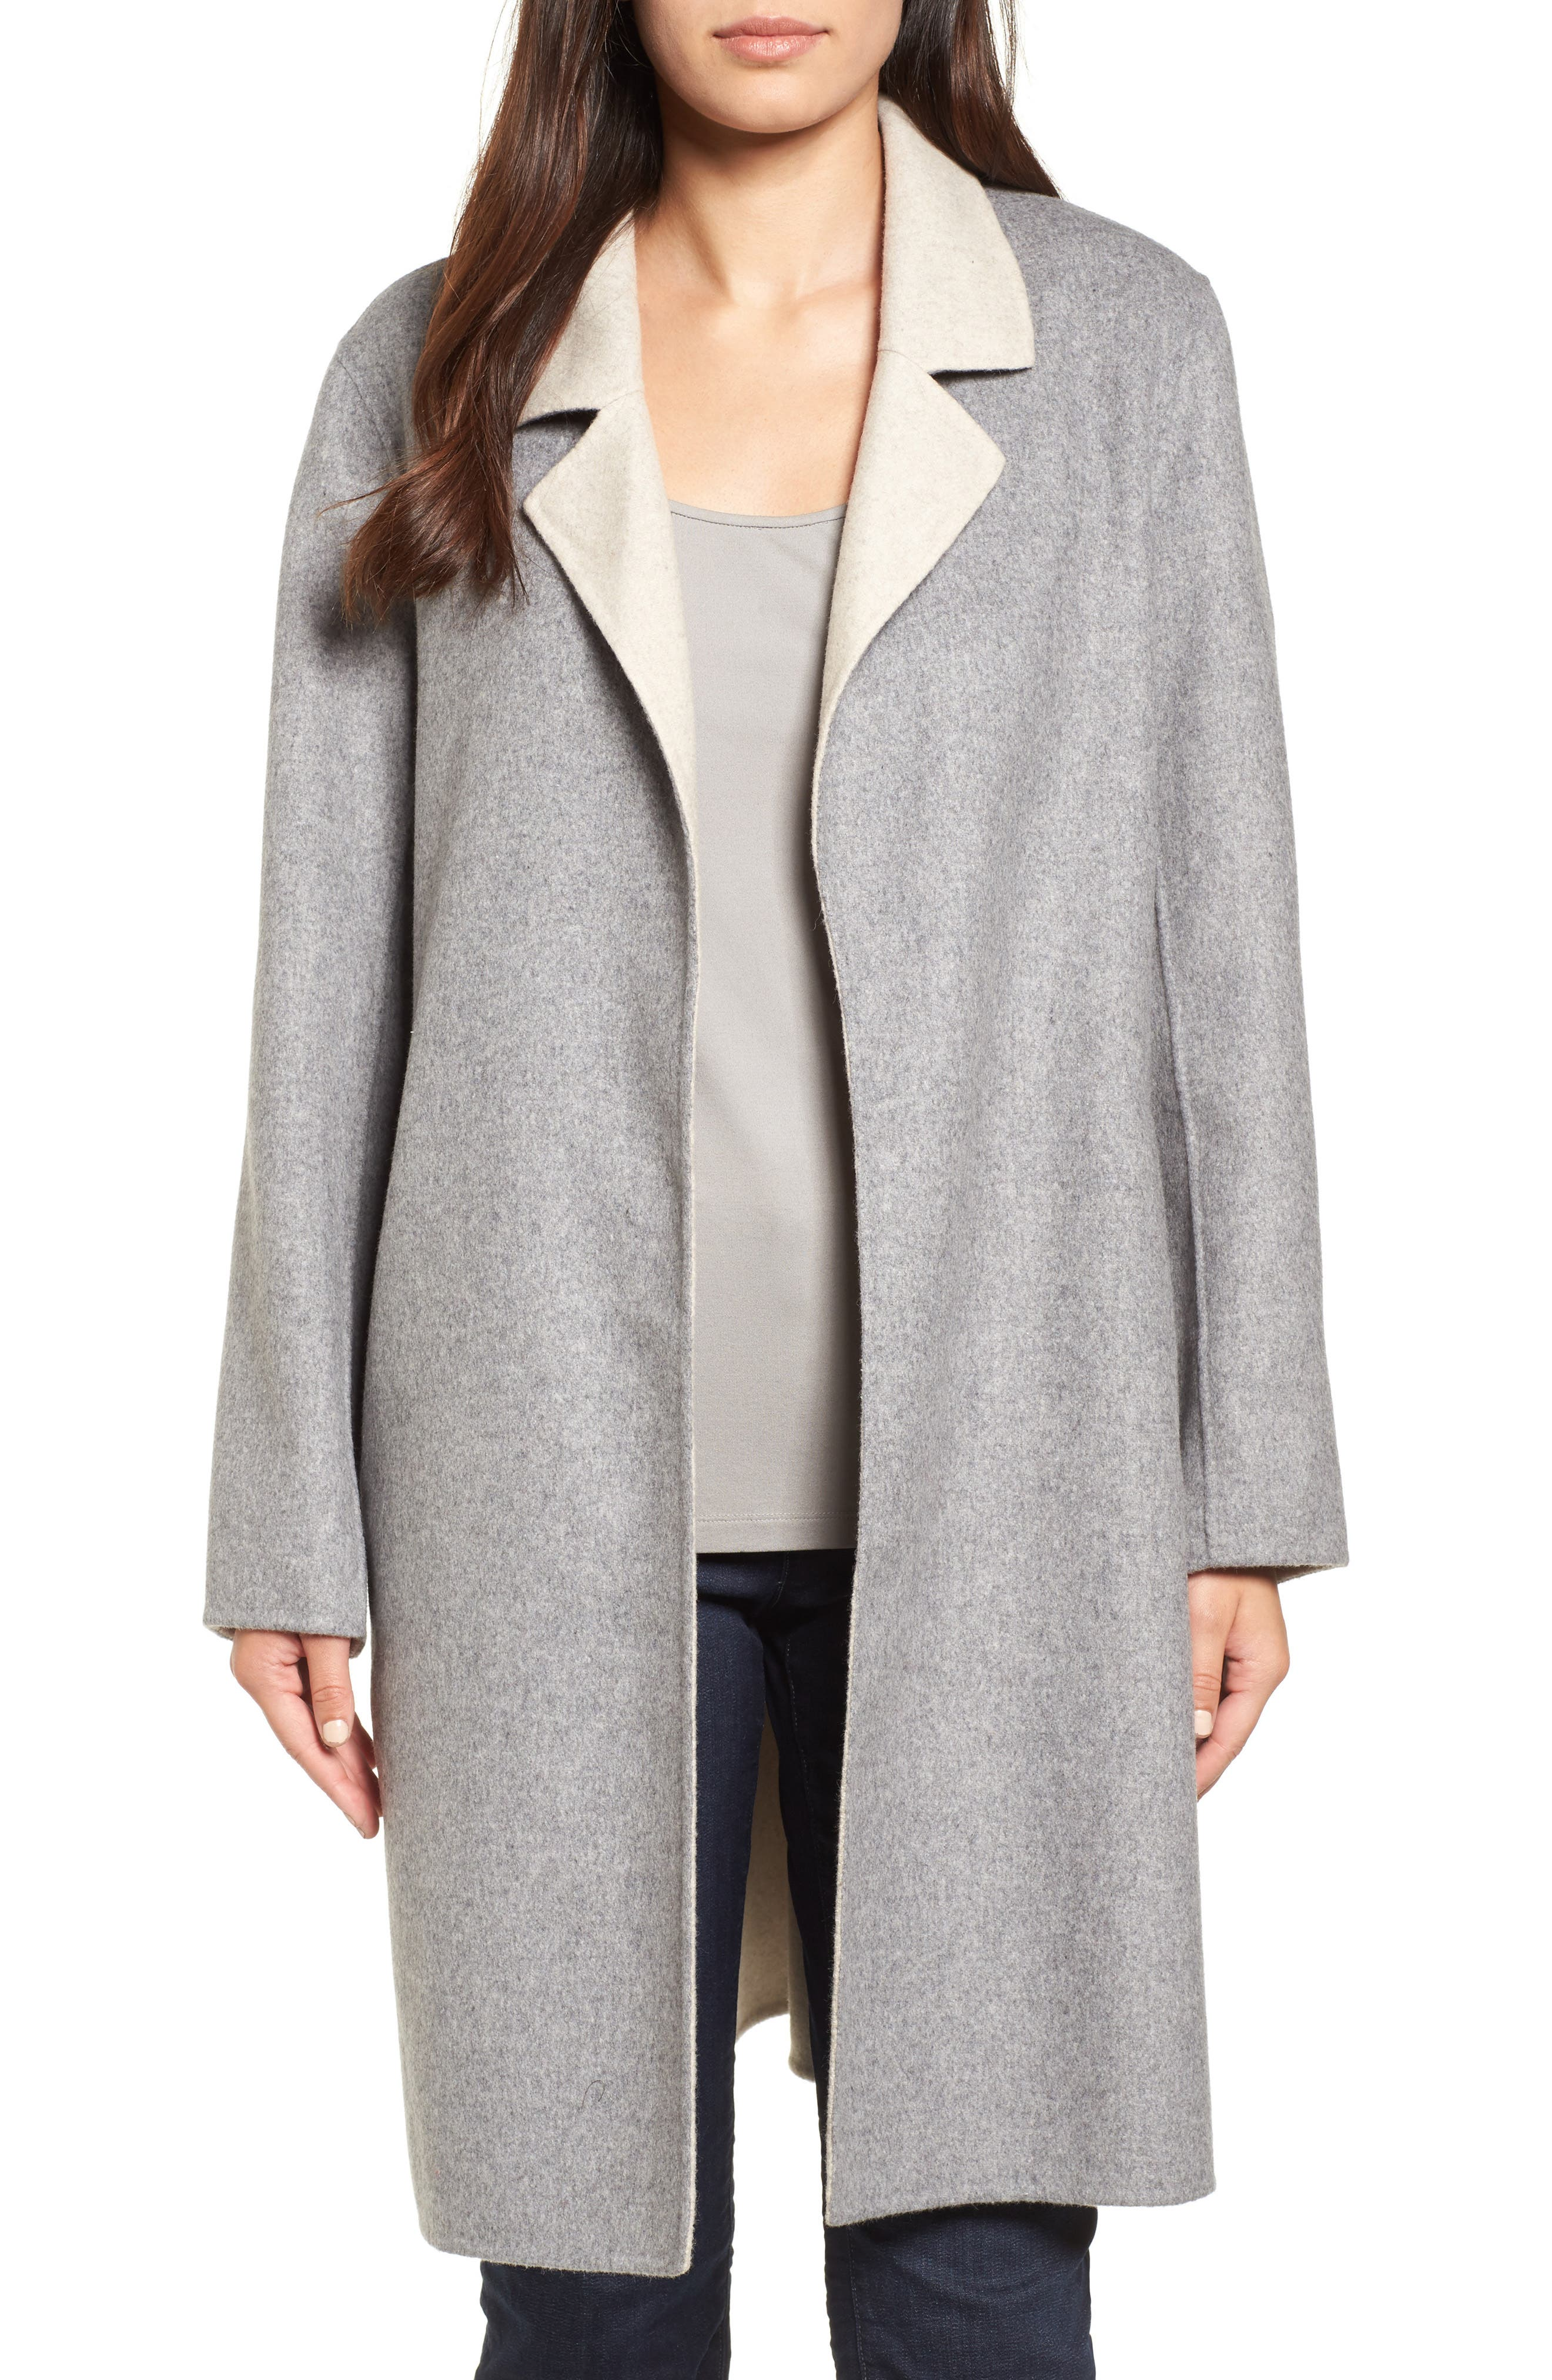 Main Image - Eileen Fisher Notch Collar Long Wool Blend Jacket